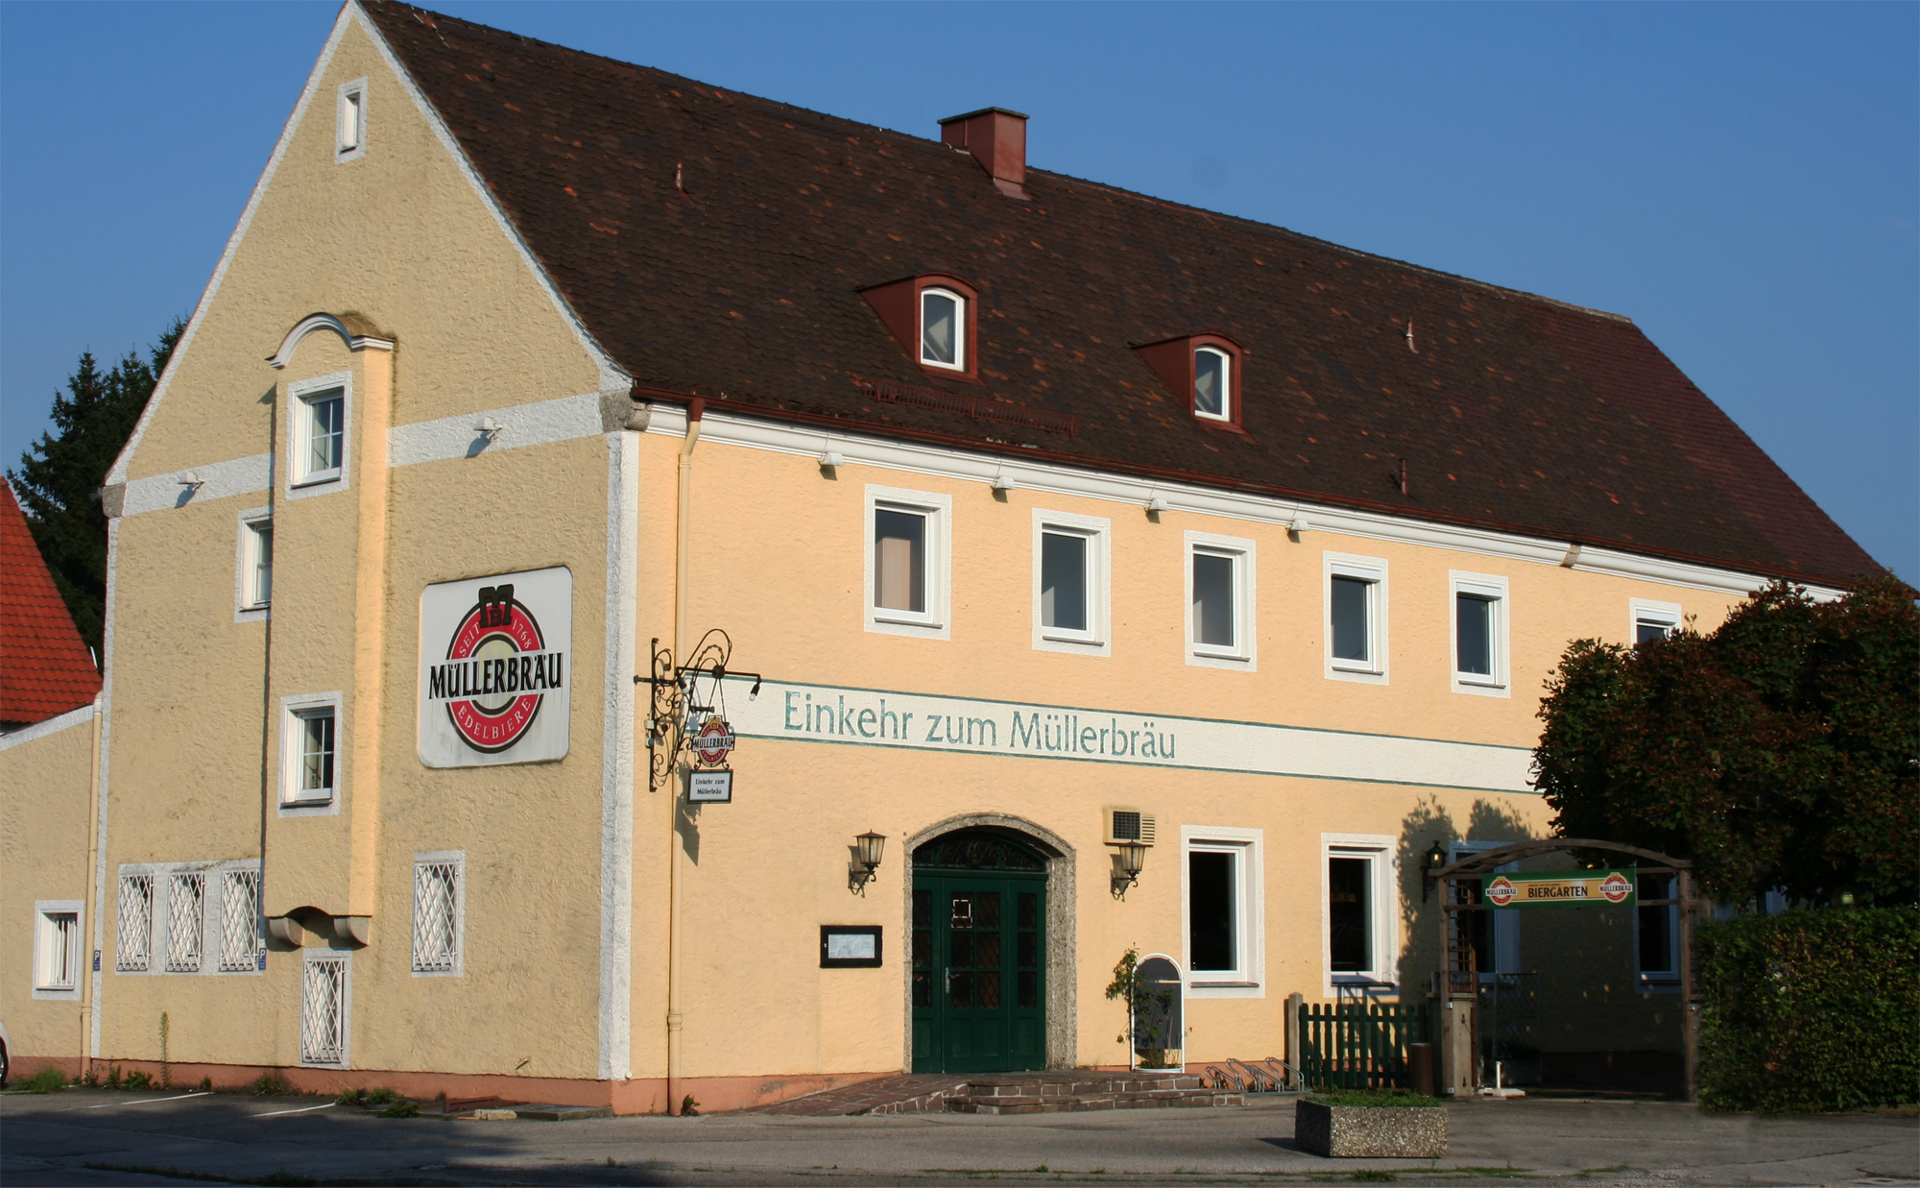 Haus_bearbeitet_1920